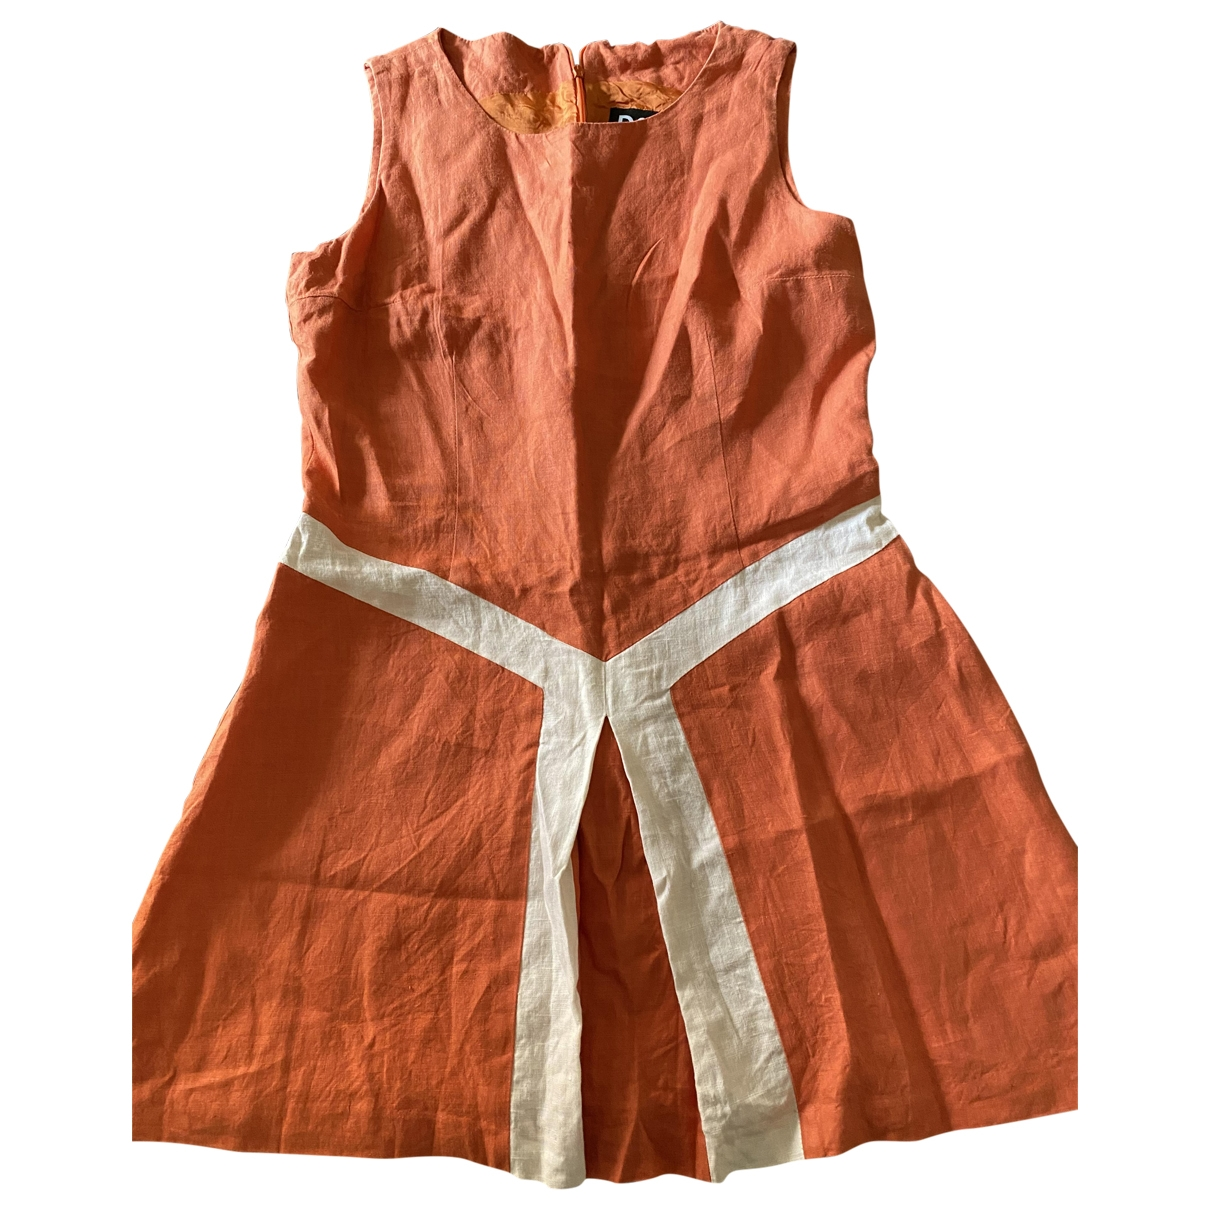 D&g \N Orange Linen dress for Women 44 IT